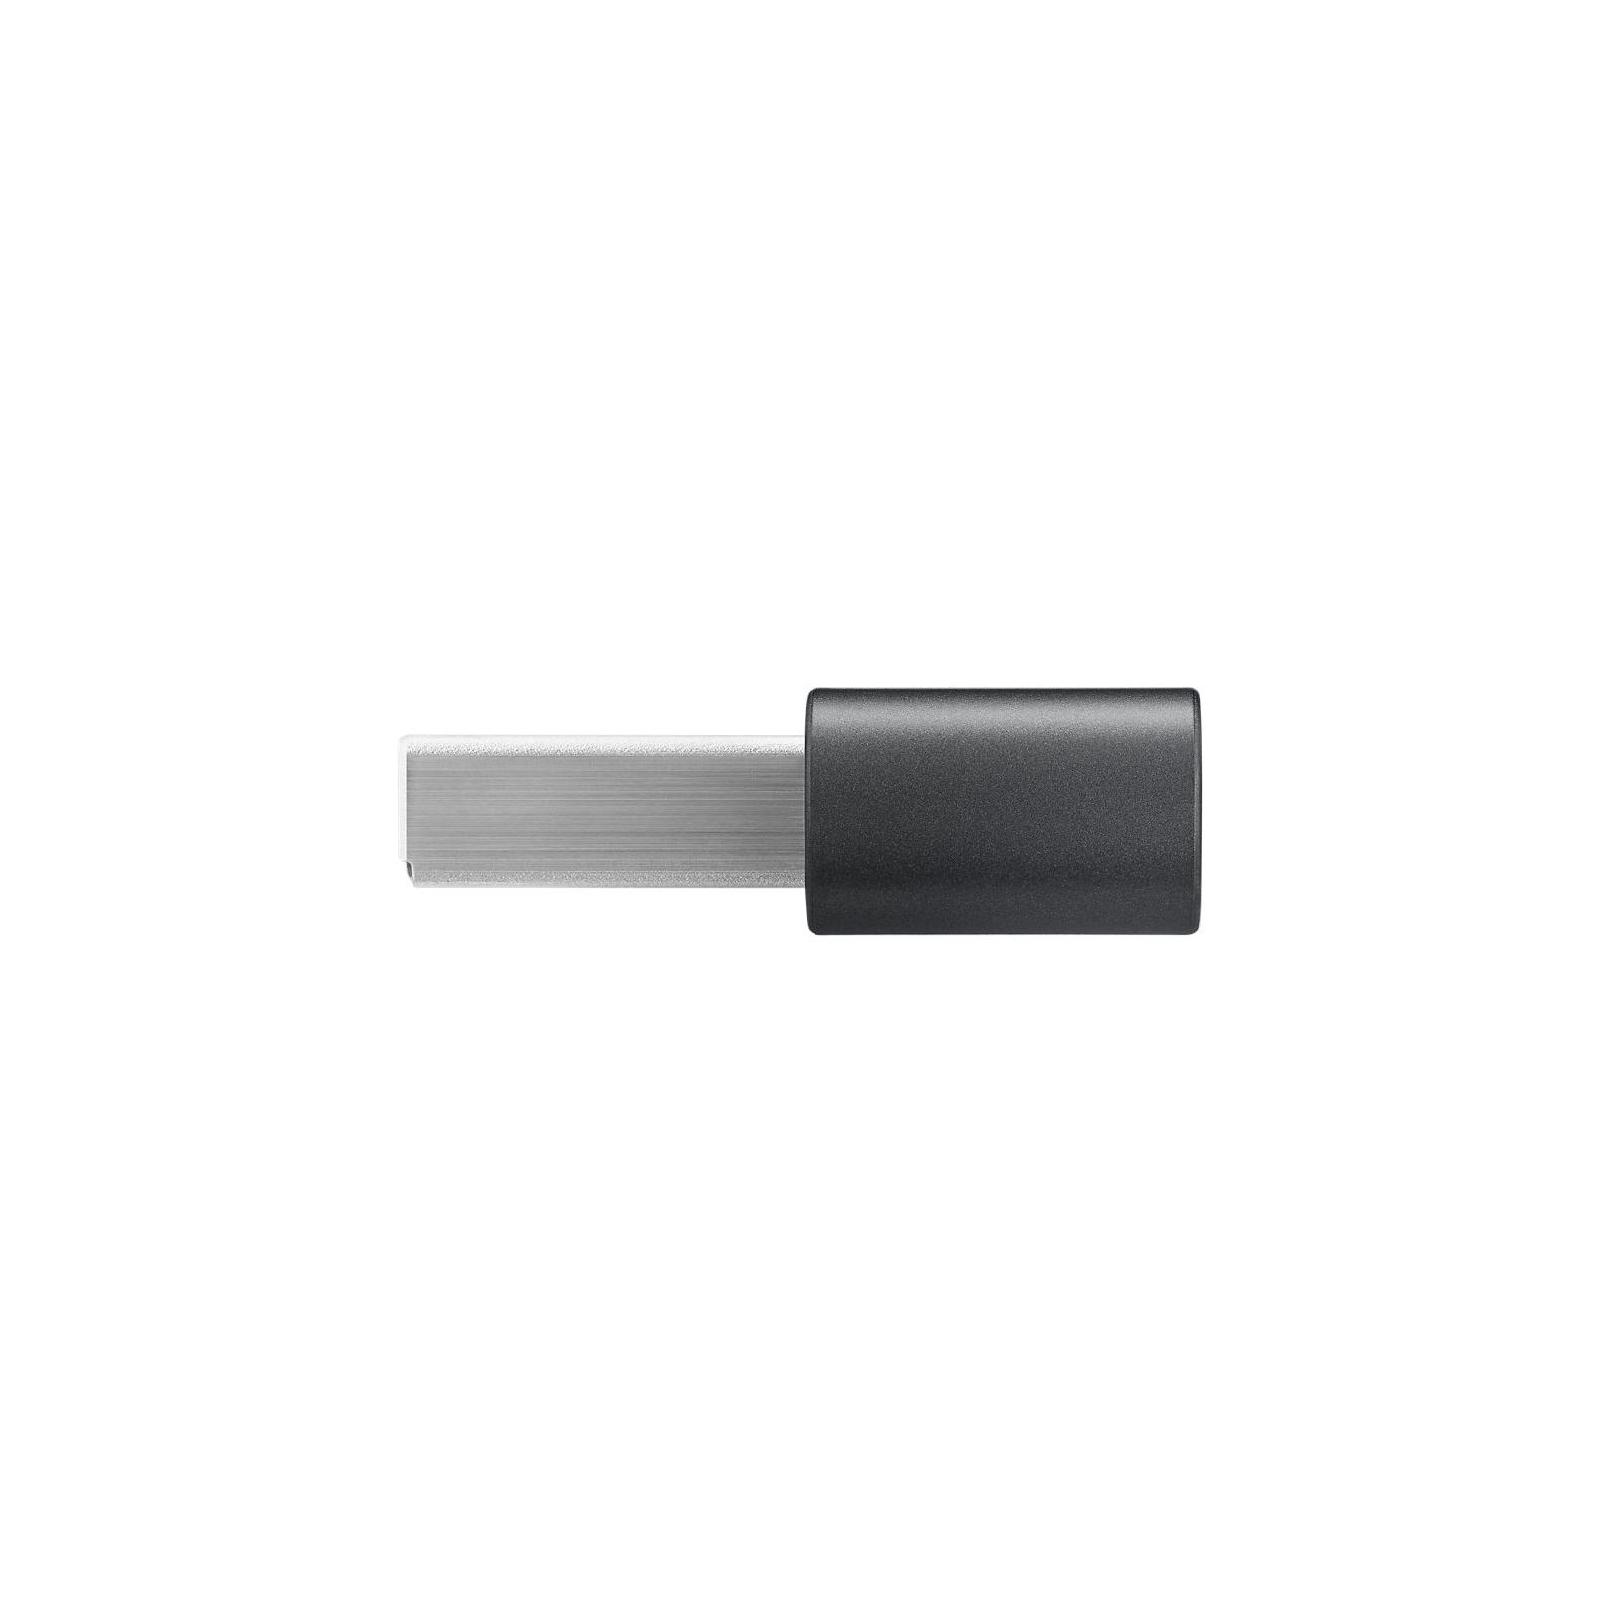 USB флеш накопитель Samsung 64GB Fit Plus USB 3.0 (MUF-64AB/APC) изображение 6